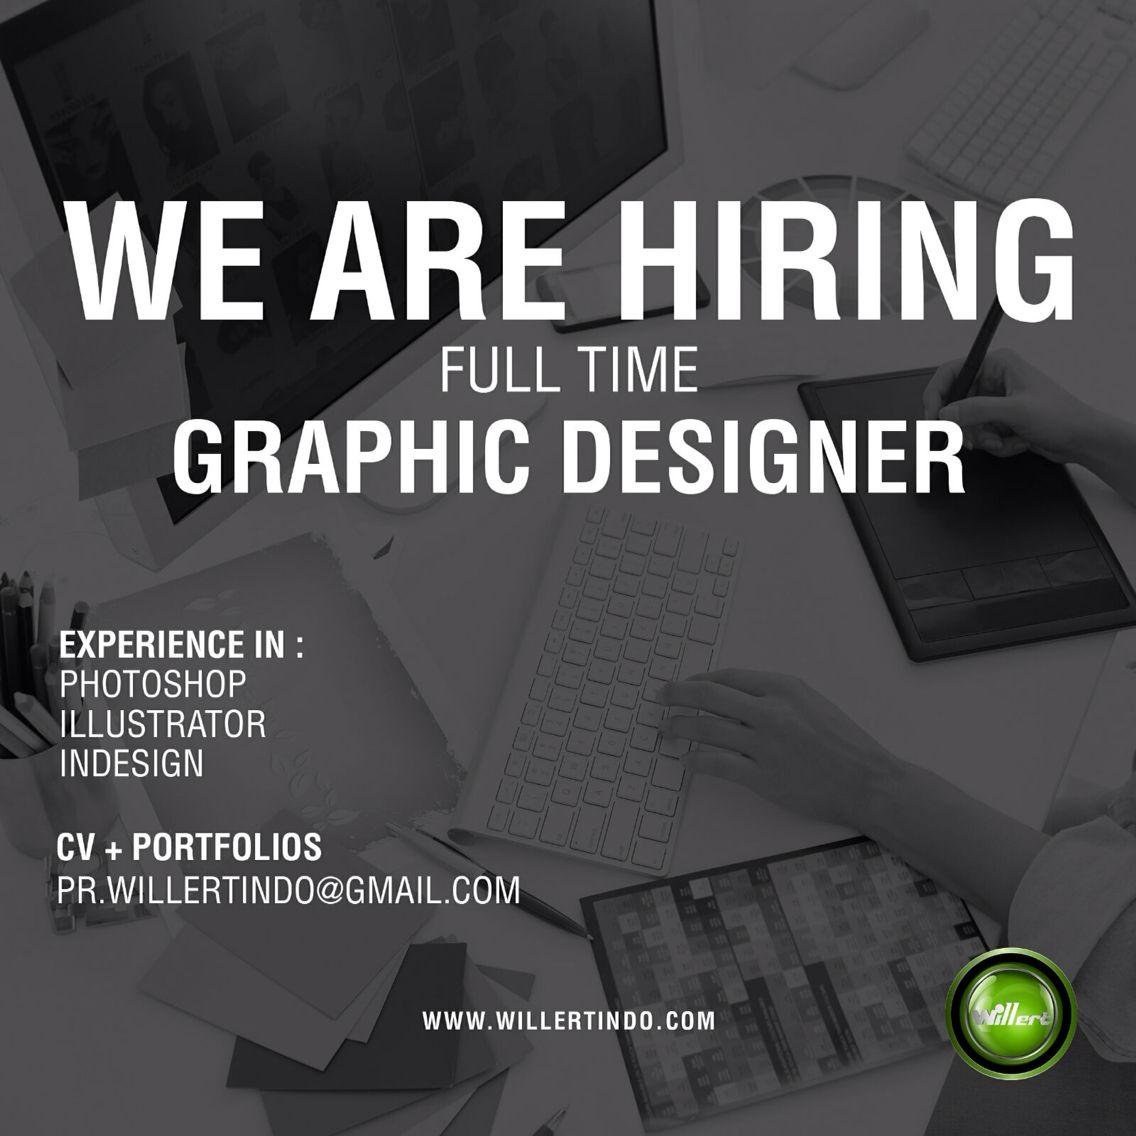 Repost Willertindo With Repostapp Willertindo Digital Marketing Agency Full Time Graphic Design Vacancy Requirements Maximum Age 29 Years Old Desain